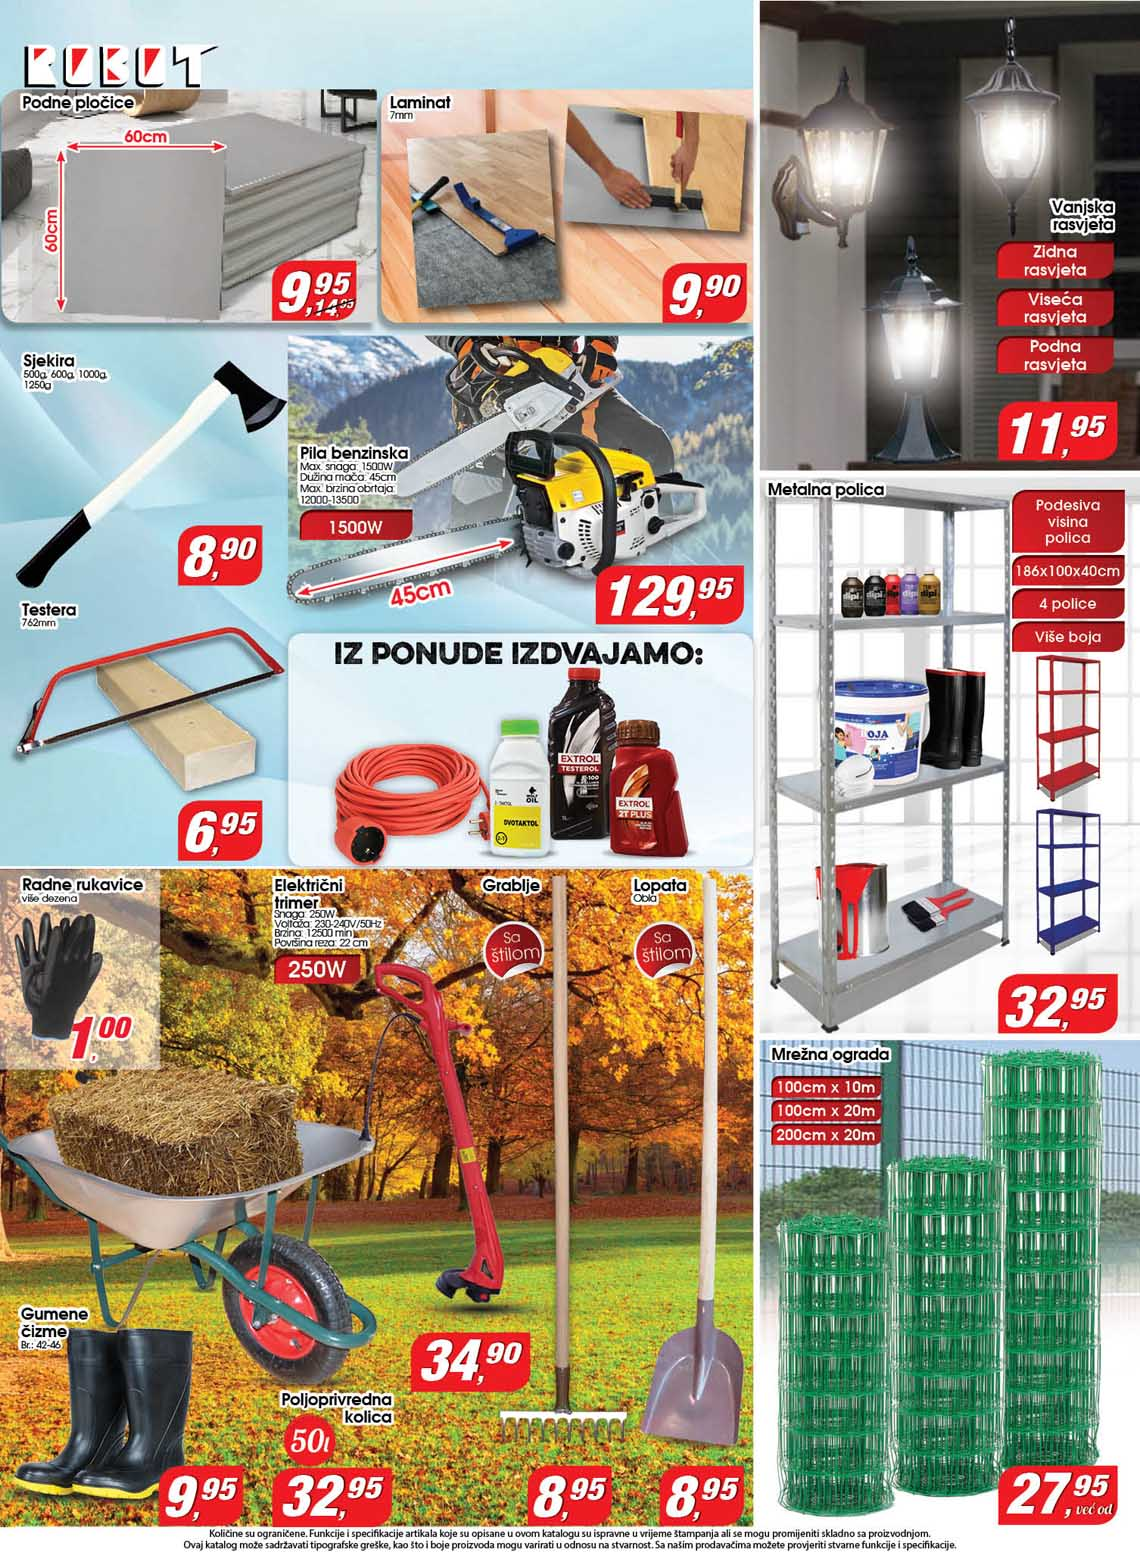 ROBOT marketi